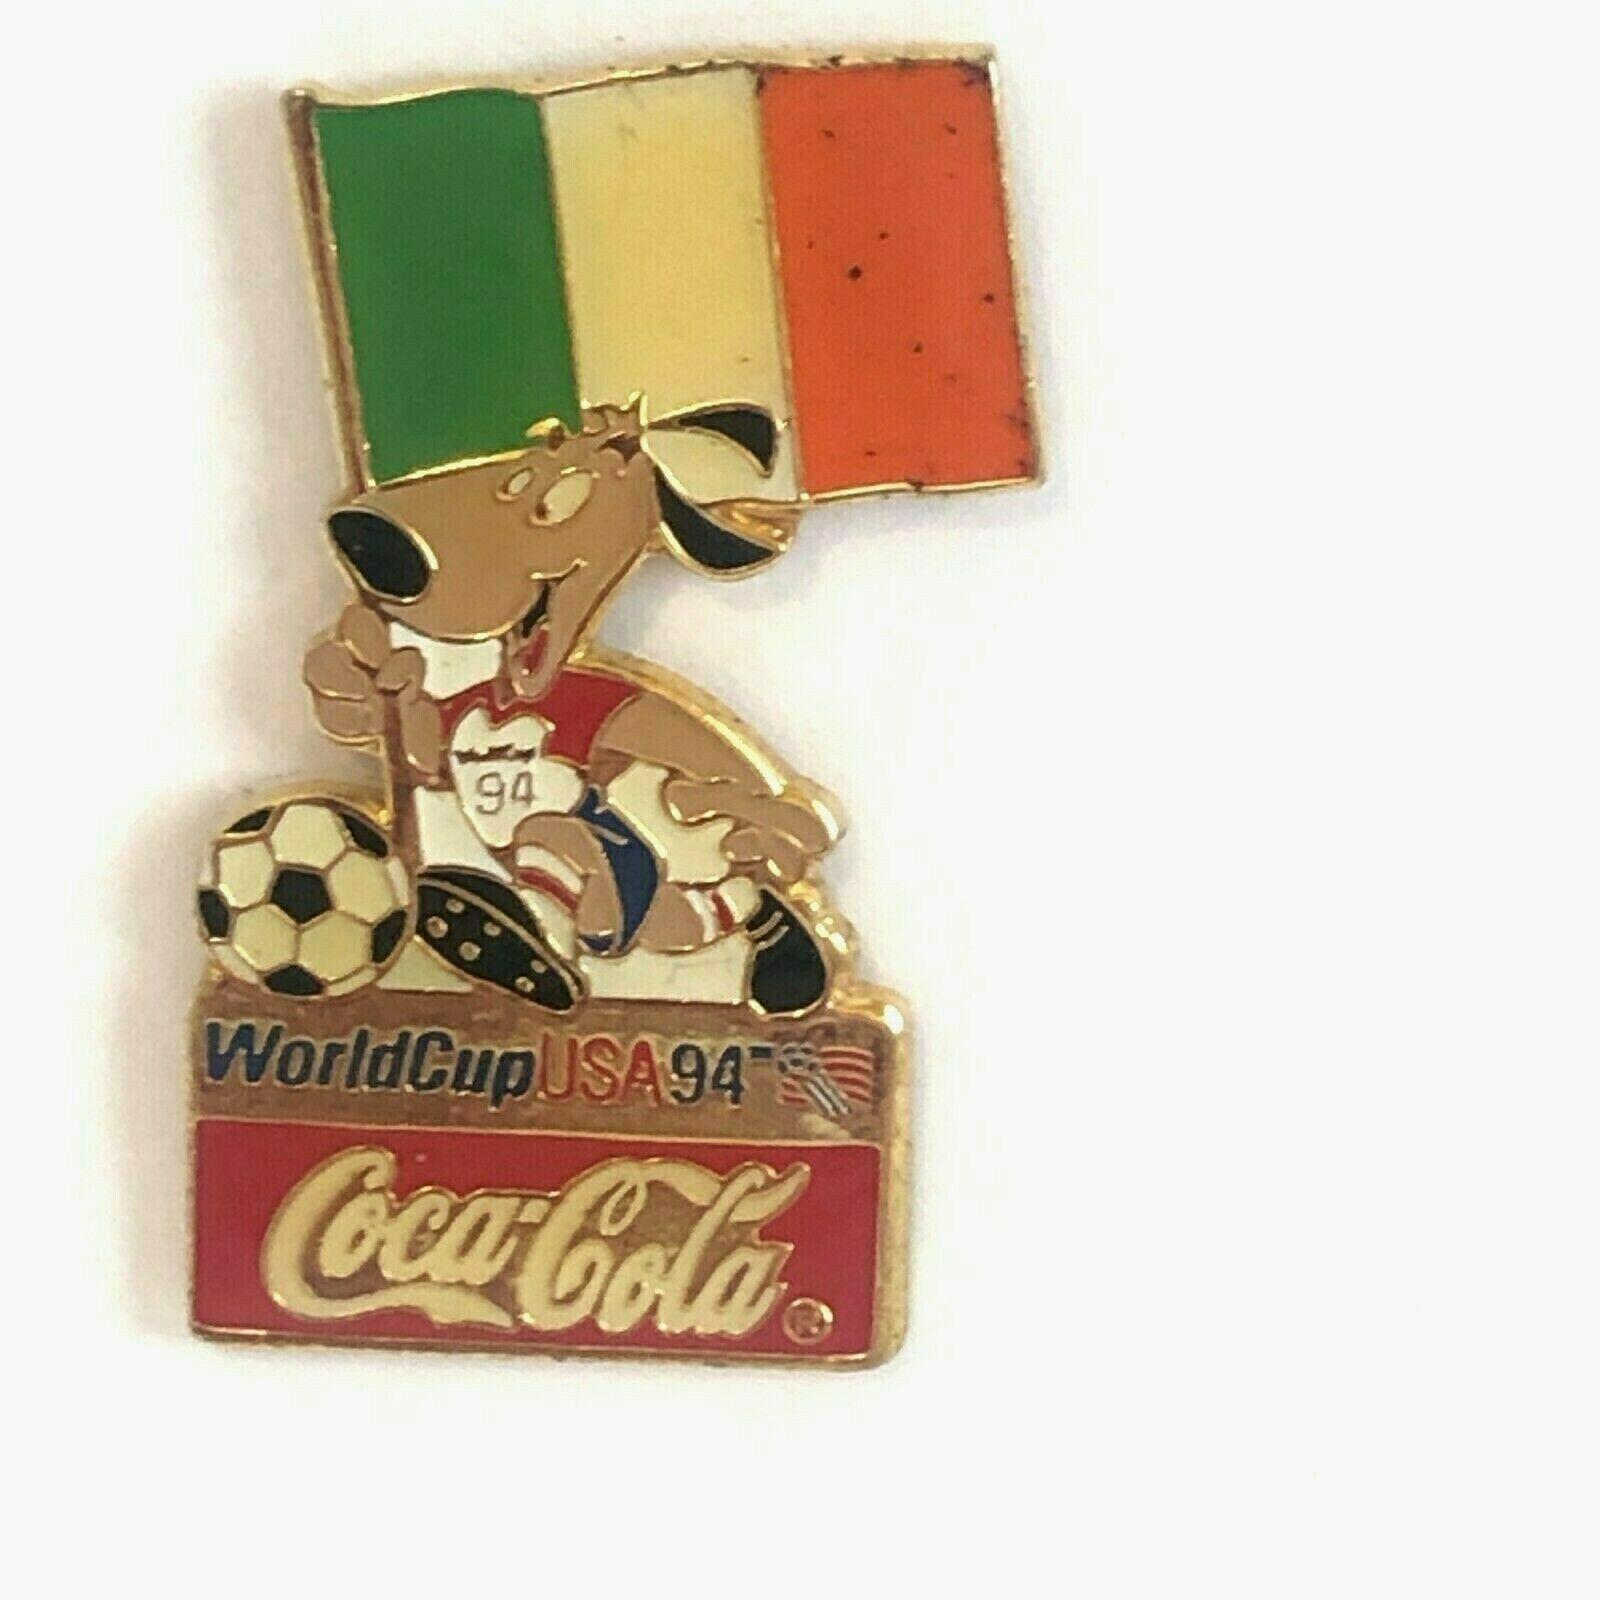 Coca Cola Ireland World Cup 1994 Lapel Pin Flag Striker the Dog Soccer Ball - $13.99